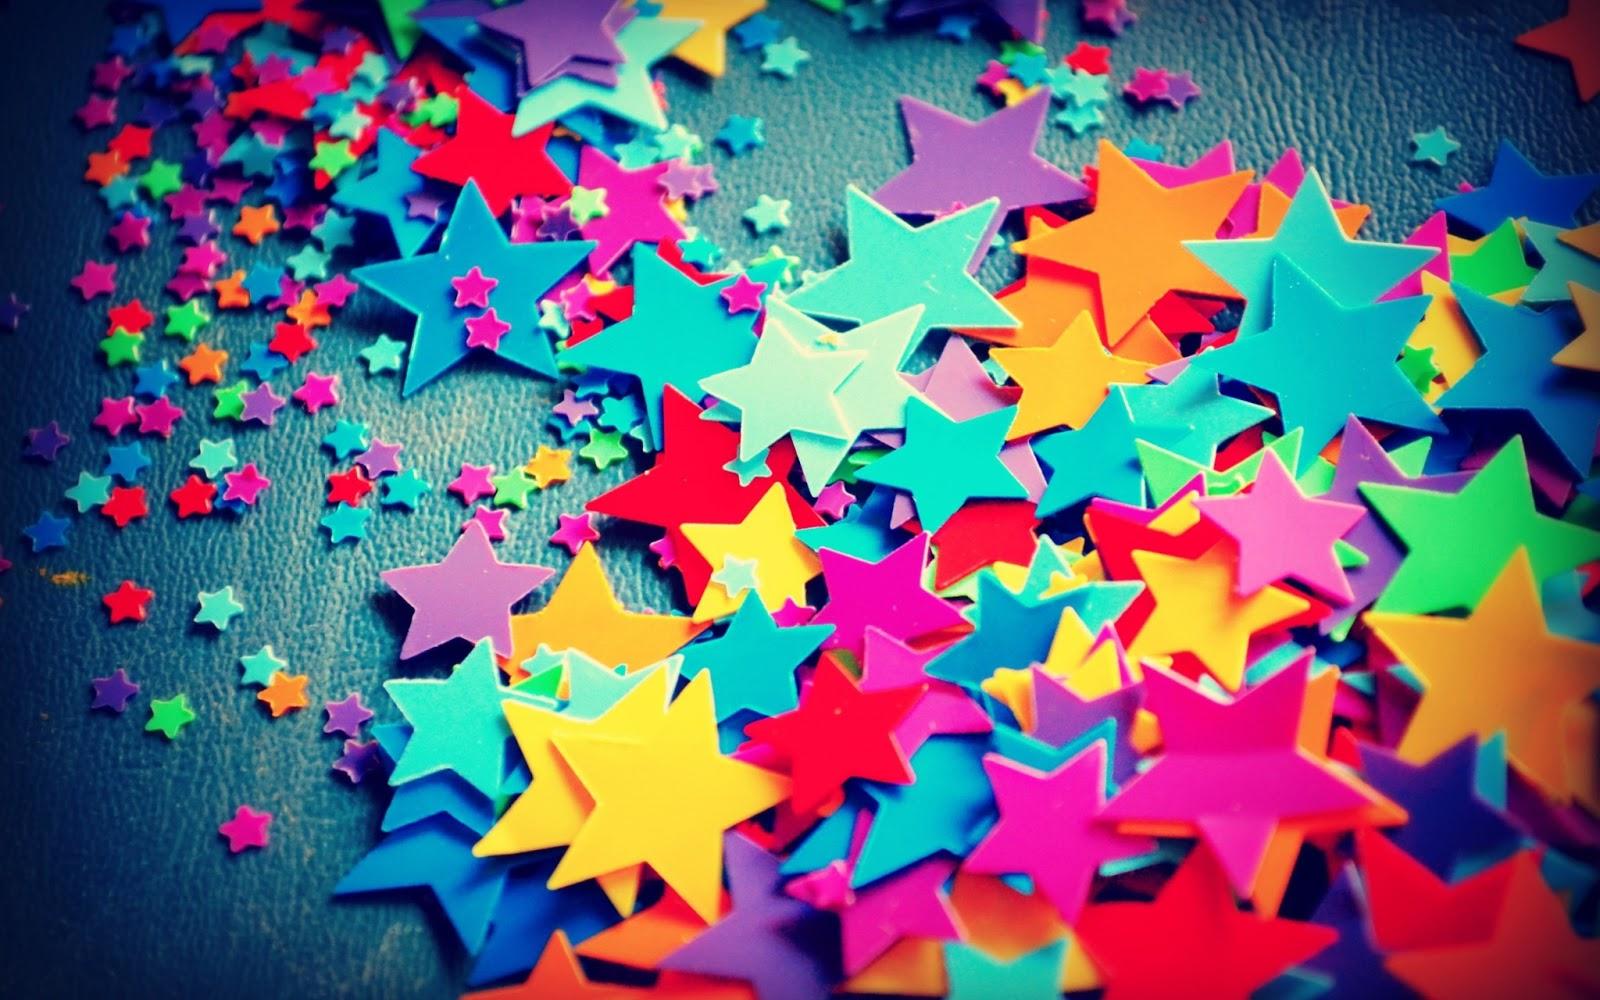 Wallpaper de estrellas de colores tumbrl